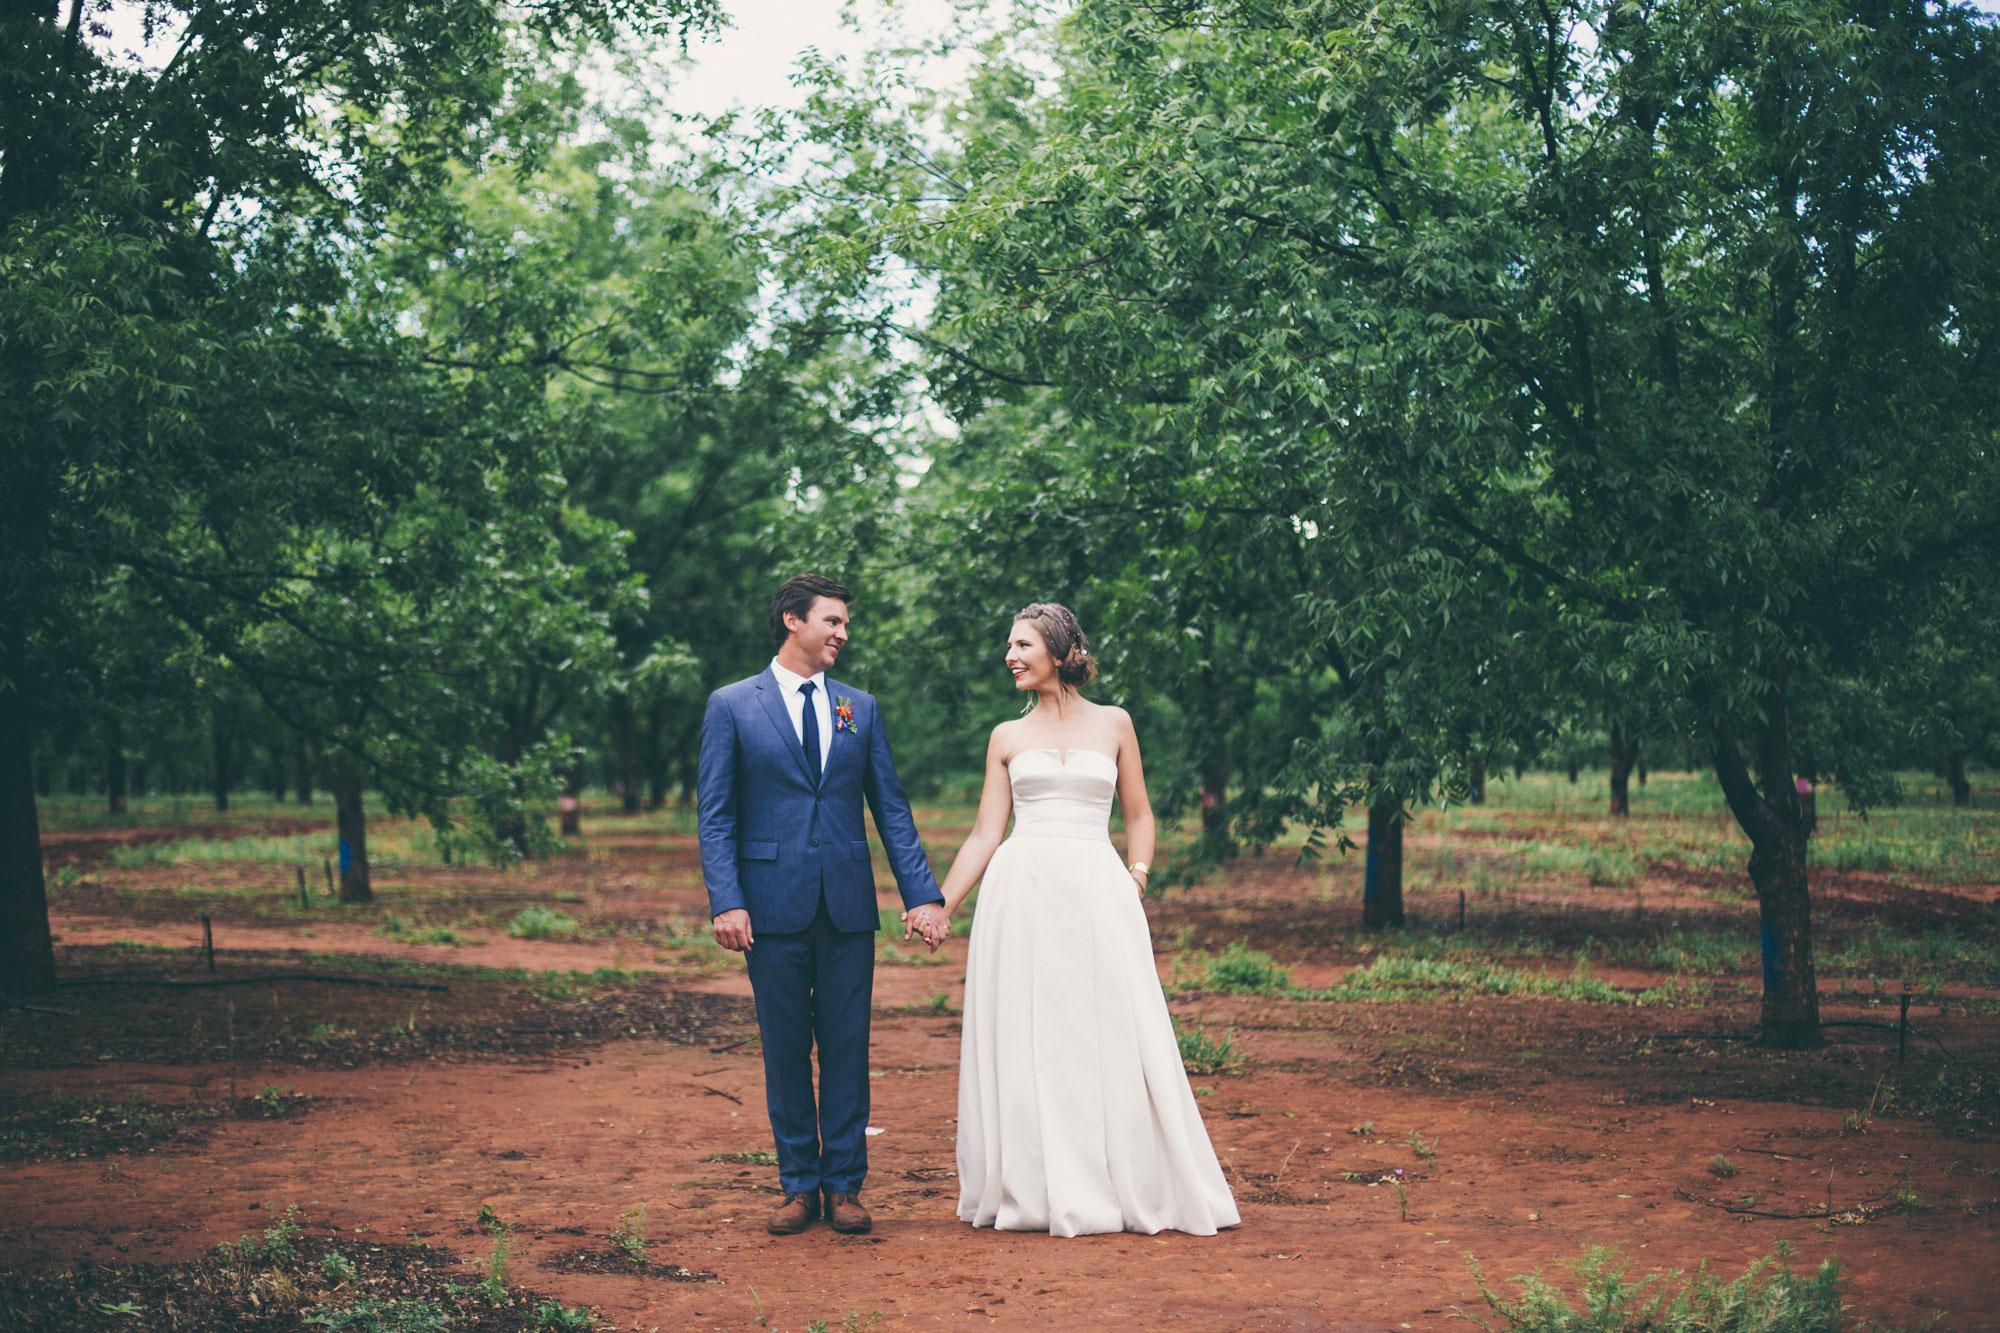 The Nutcracker_Wedding Photography_Maryke Albertyn 38